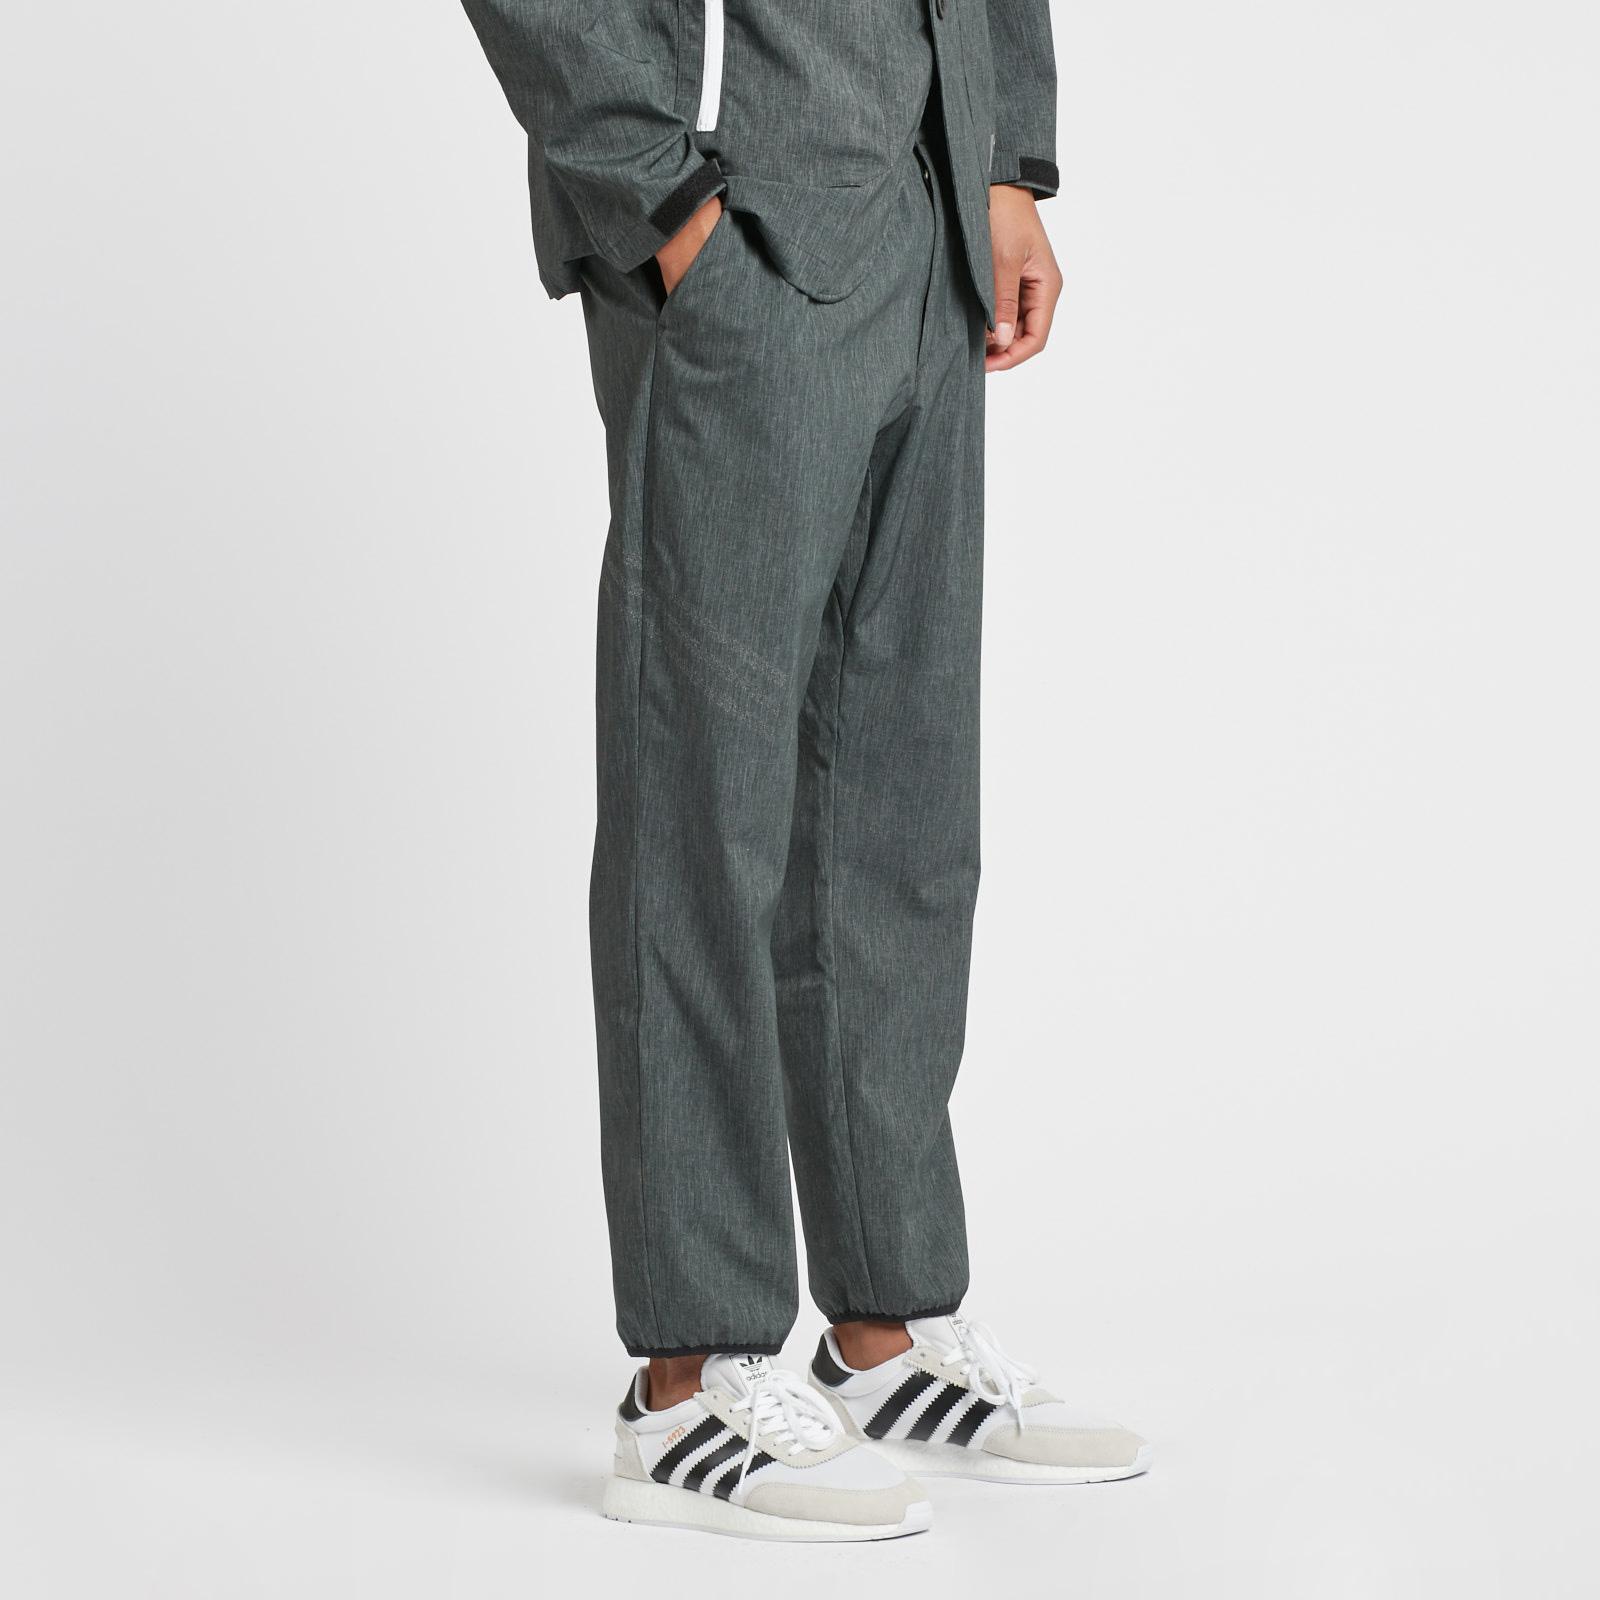 Adidas x United Arrows & Sons: Urban Track Pants [Black